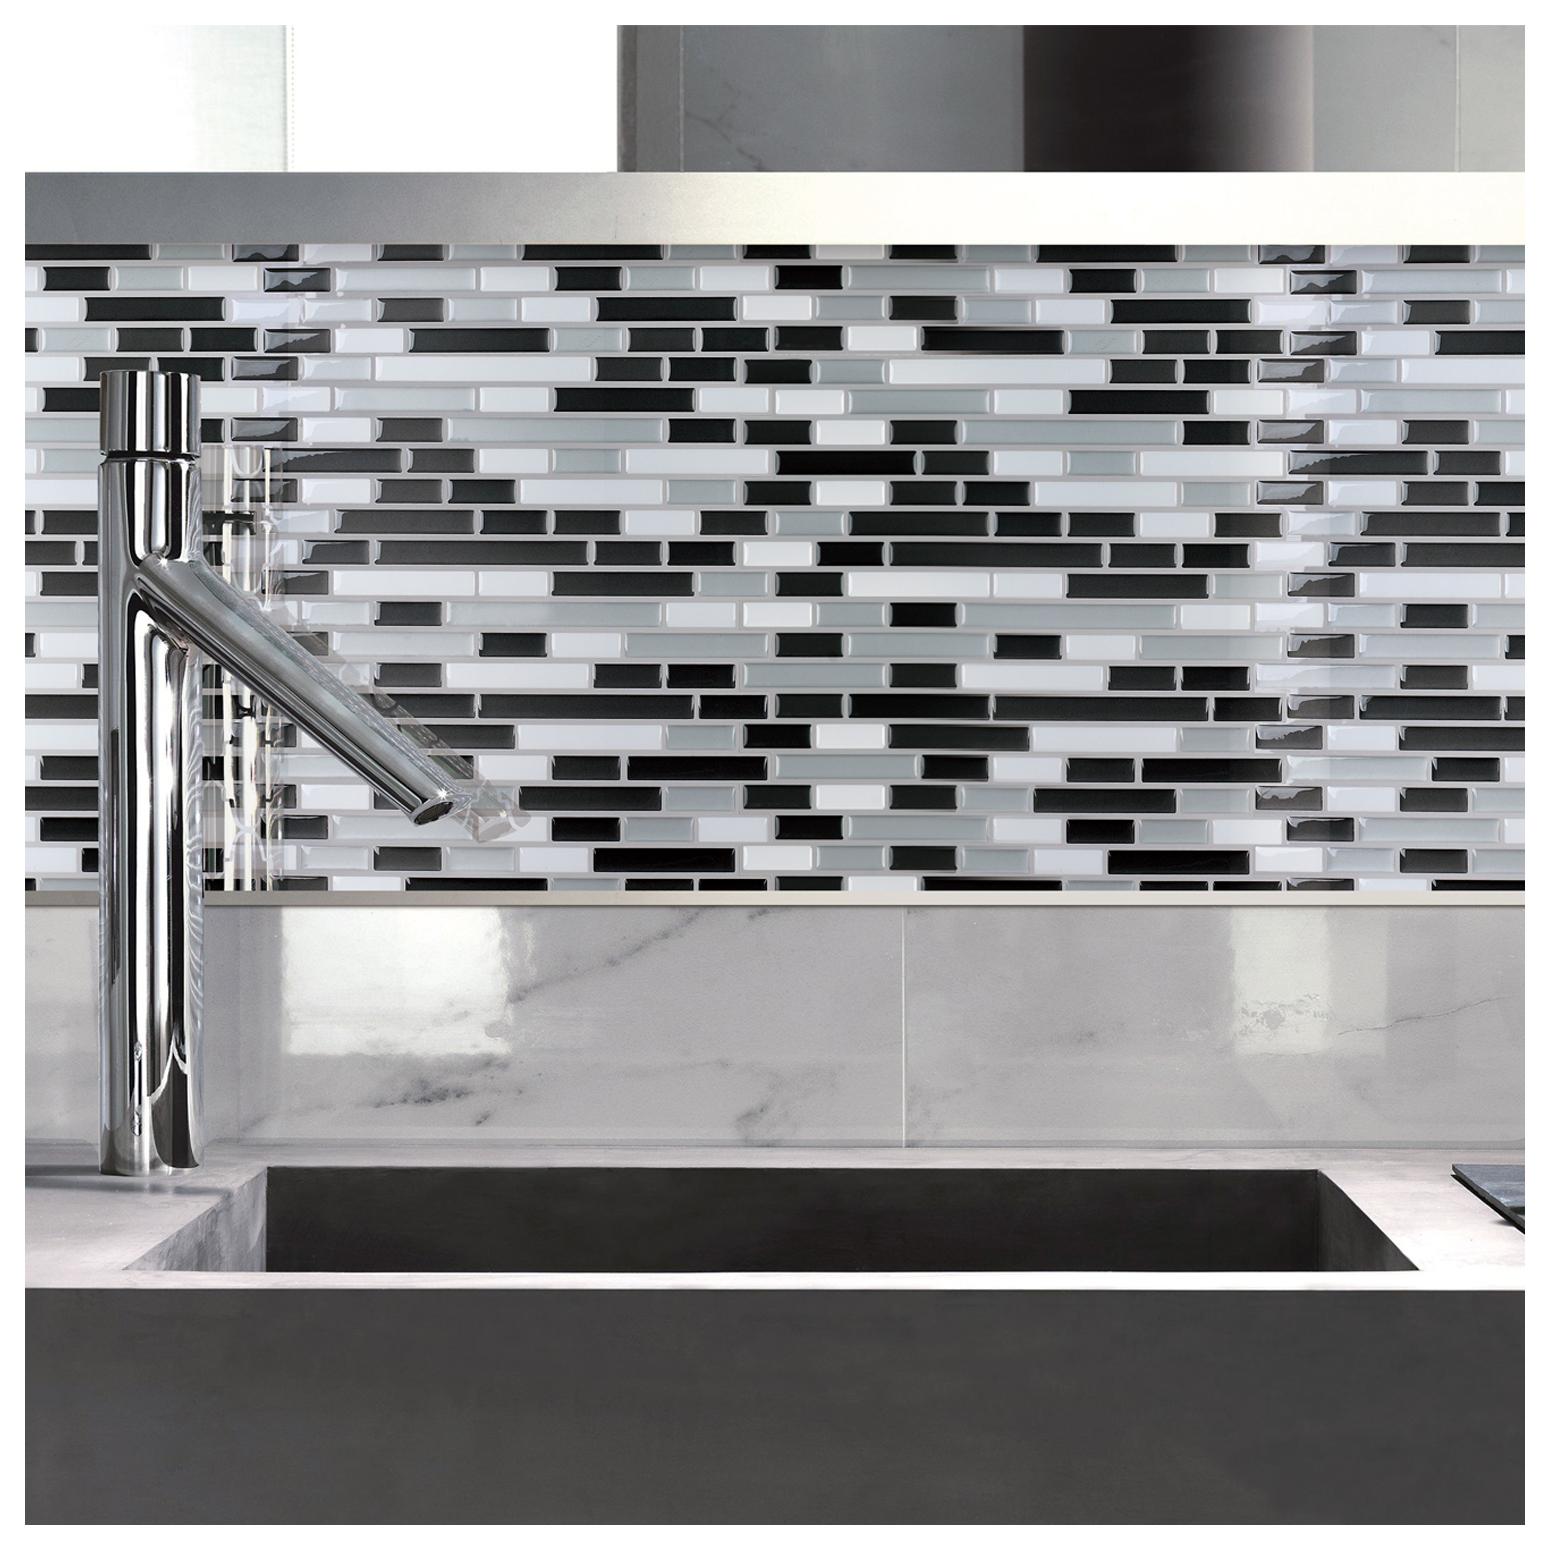 h peel and stick decorative mosaic new set of 27 self adhesive kitchen backsplash tile stickers vinyl peel and stick tile 3d backsplash stickers peel stick